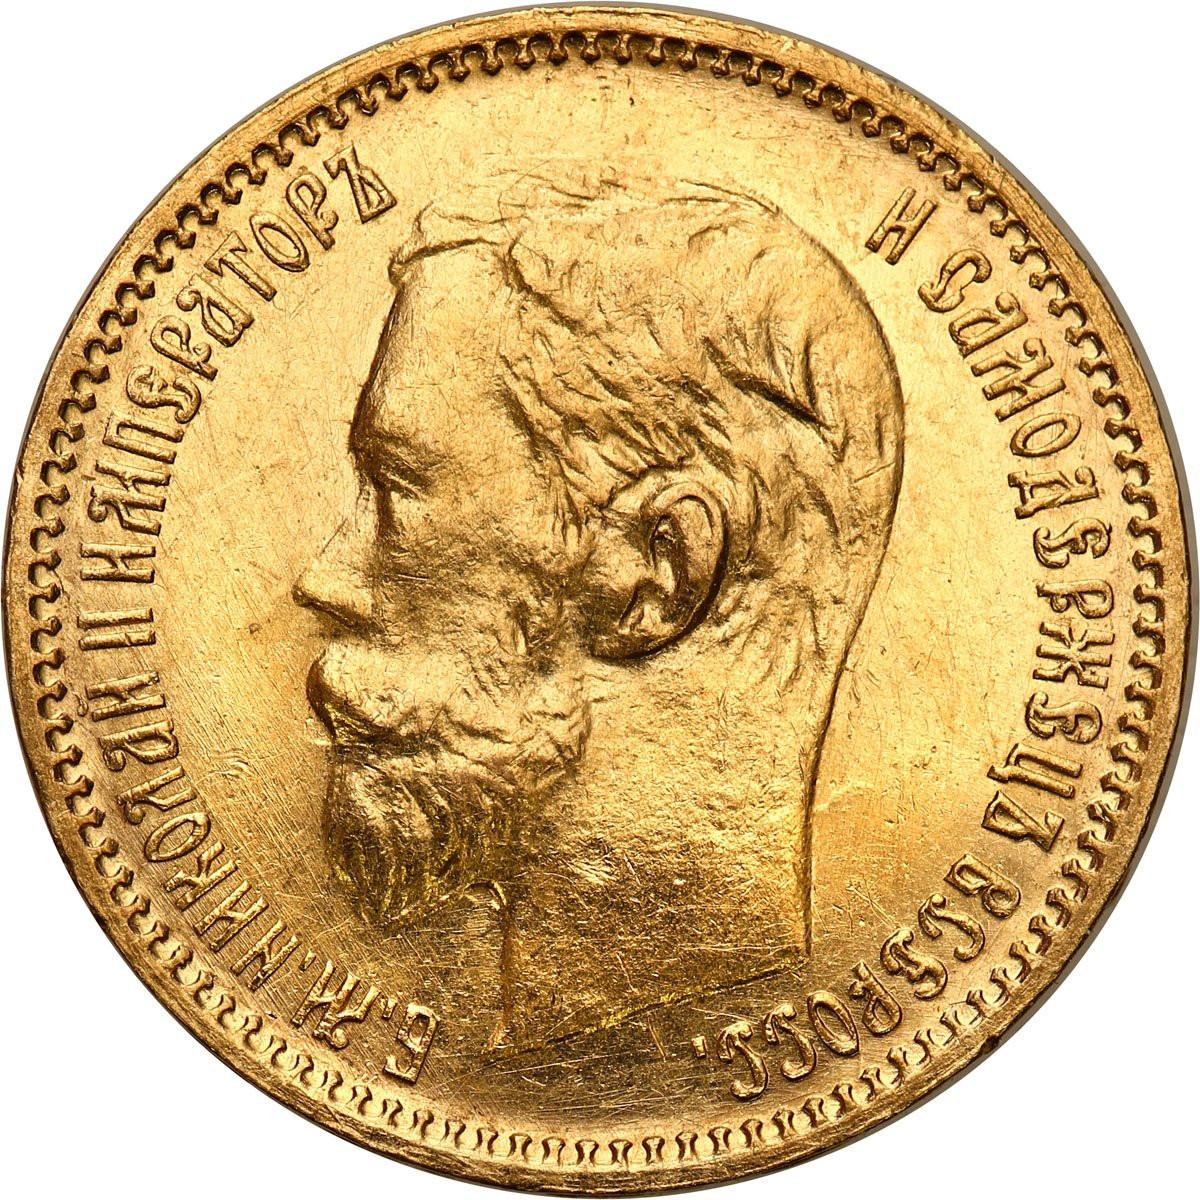 Rosja. Mikołaj II 5 rubli 1902 AP, Petersburg - PIĘKNE